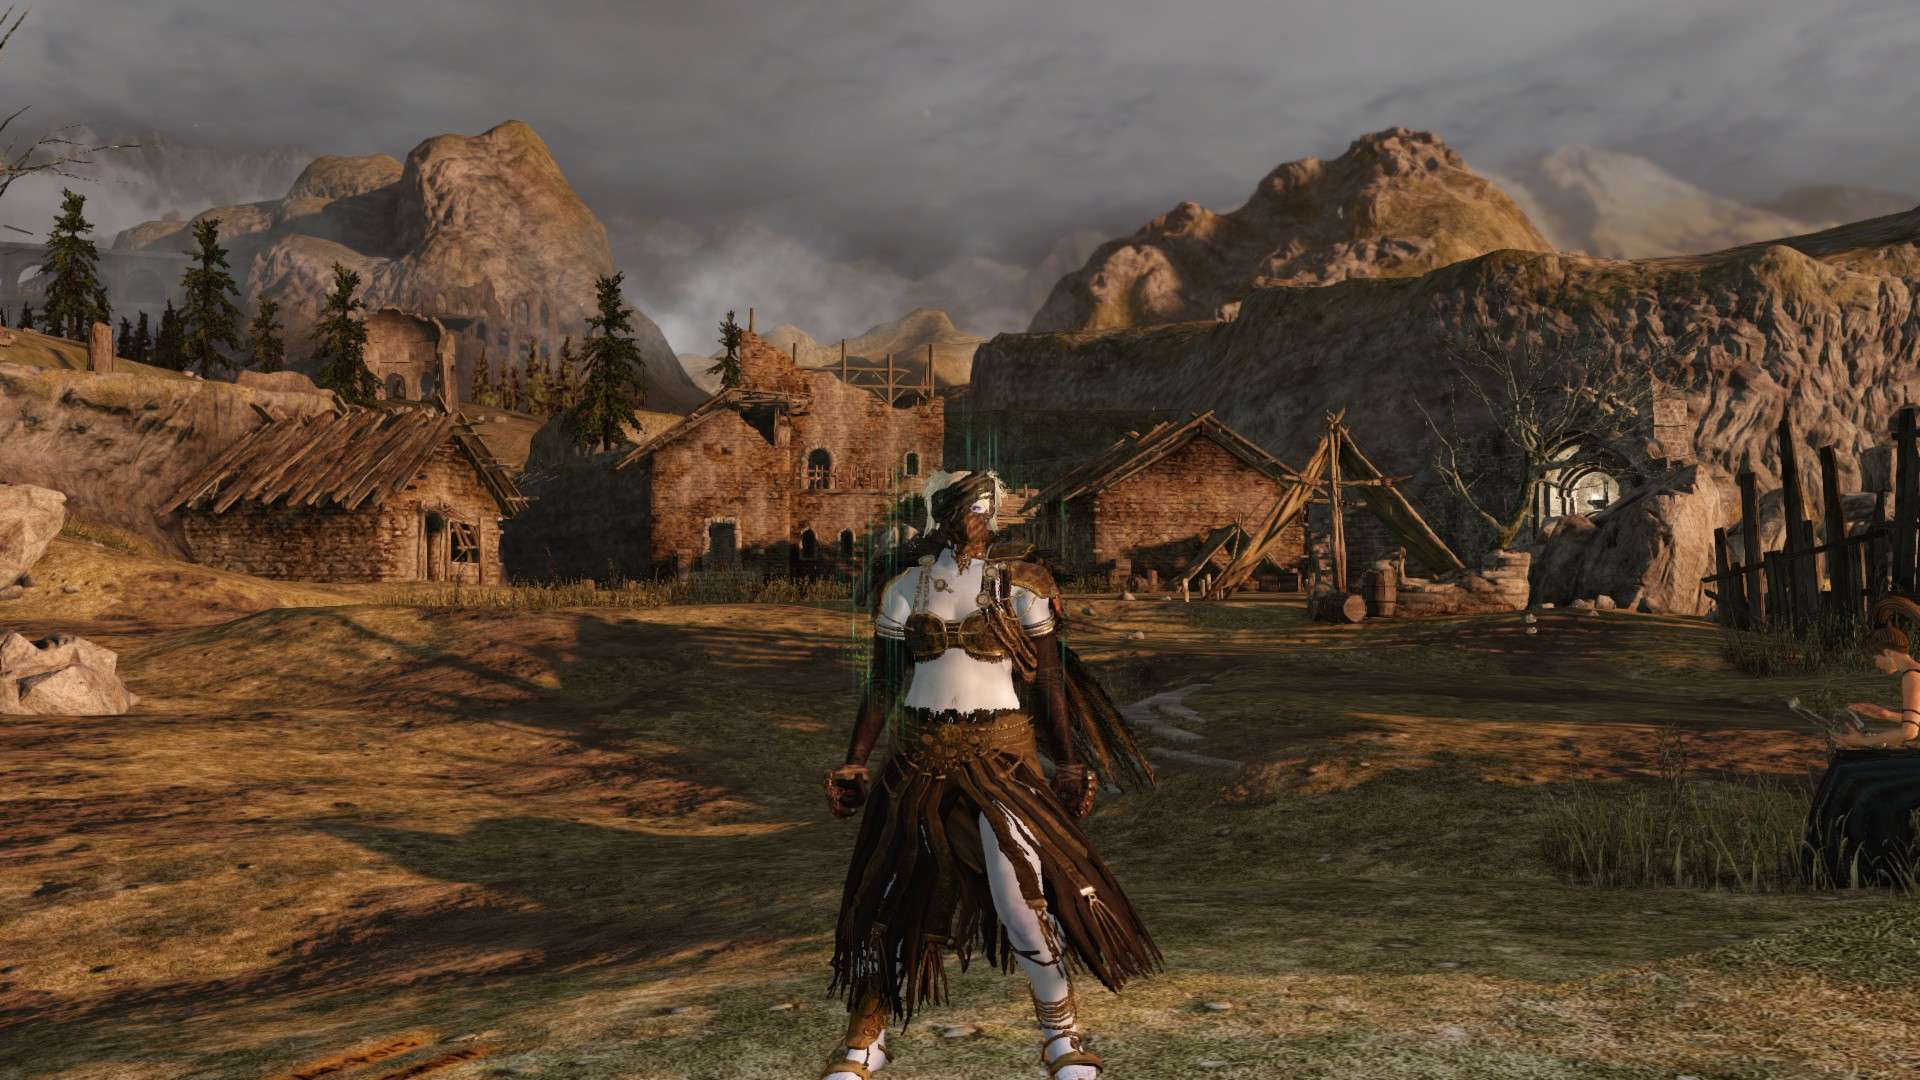 Dark Souls 2 Wallpaper: Dark Souls II Wallpapers